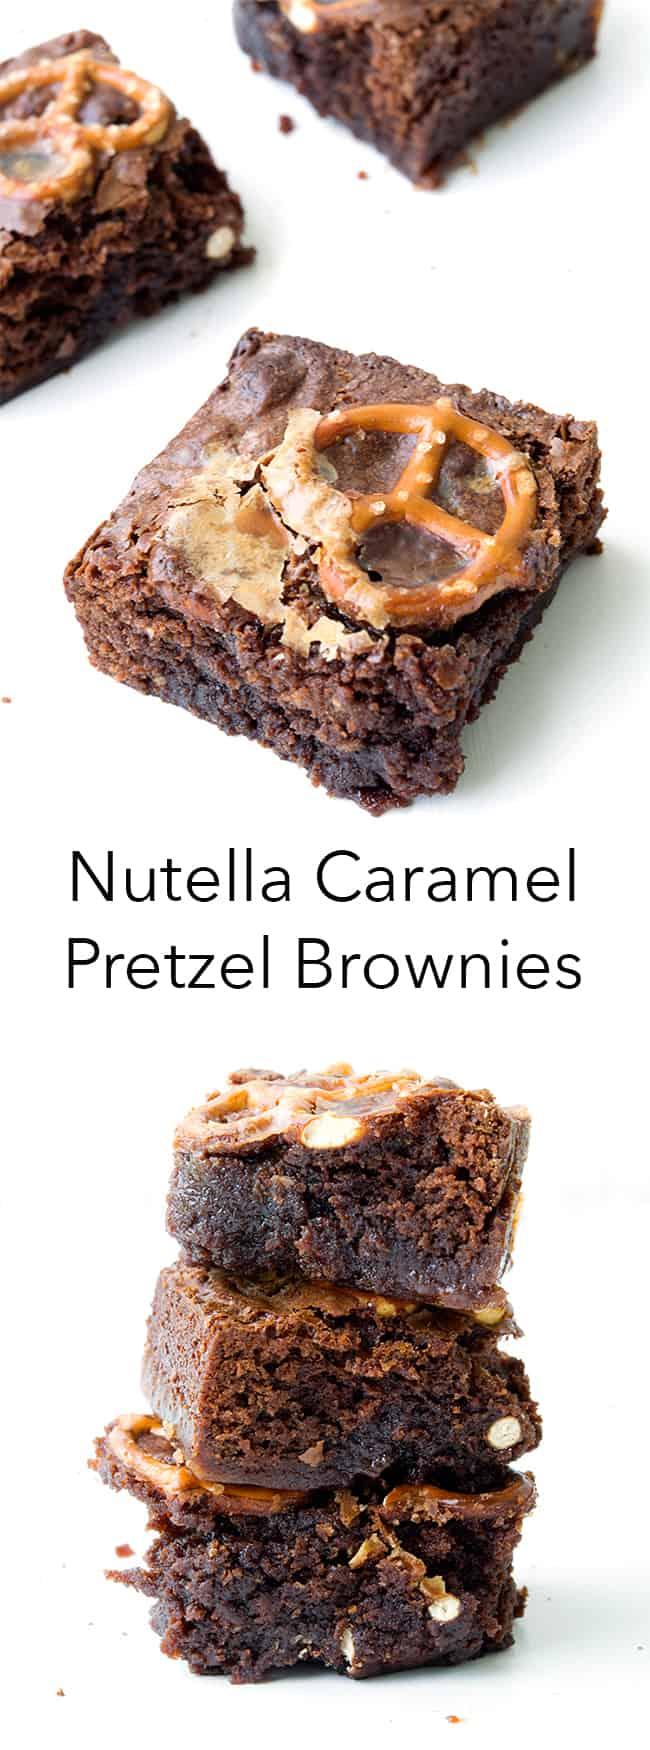 Nutella Caramel Pretzel Brownies | Sweetest Menu